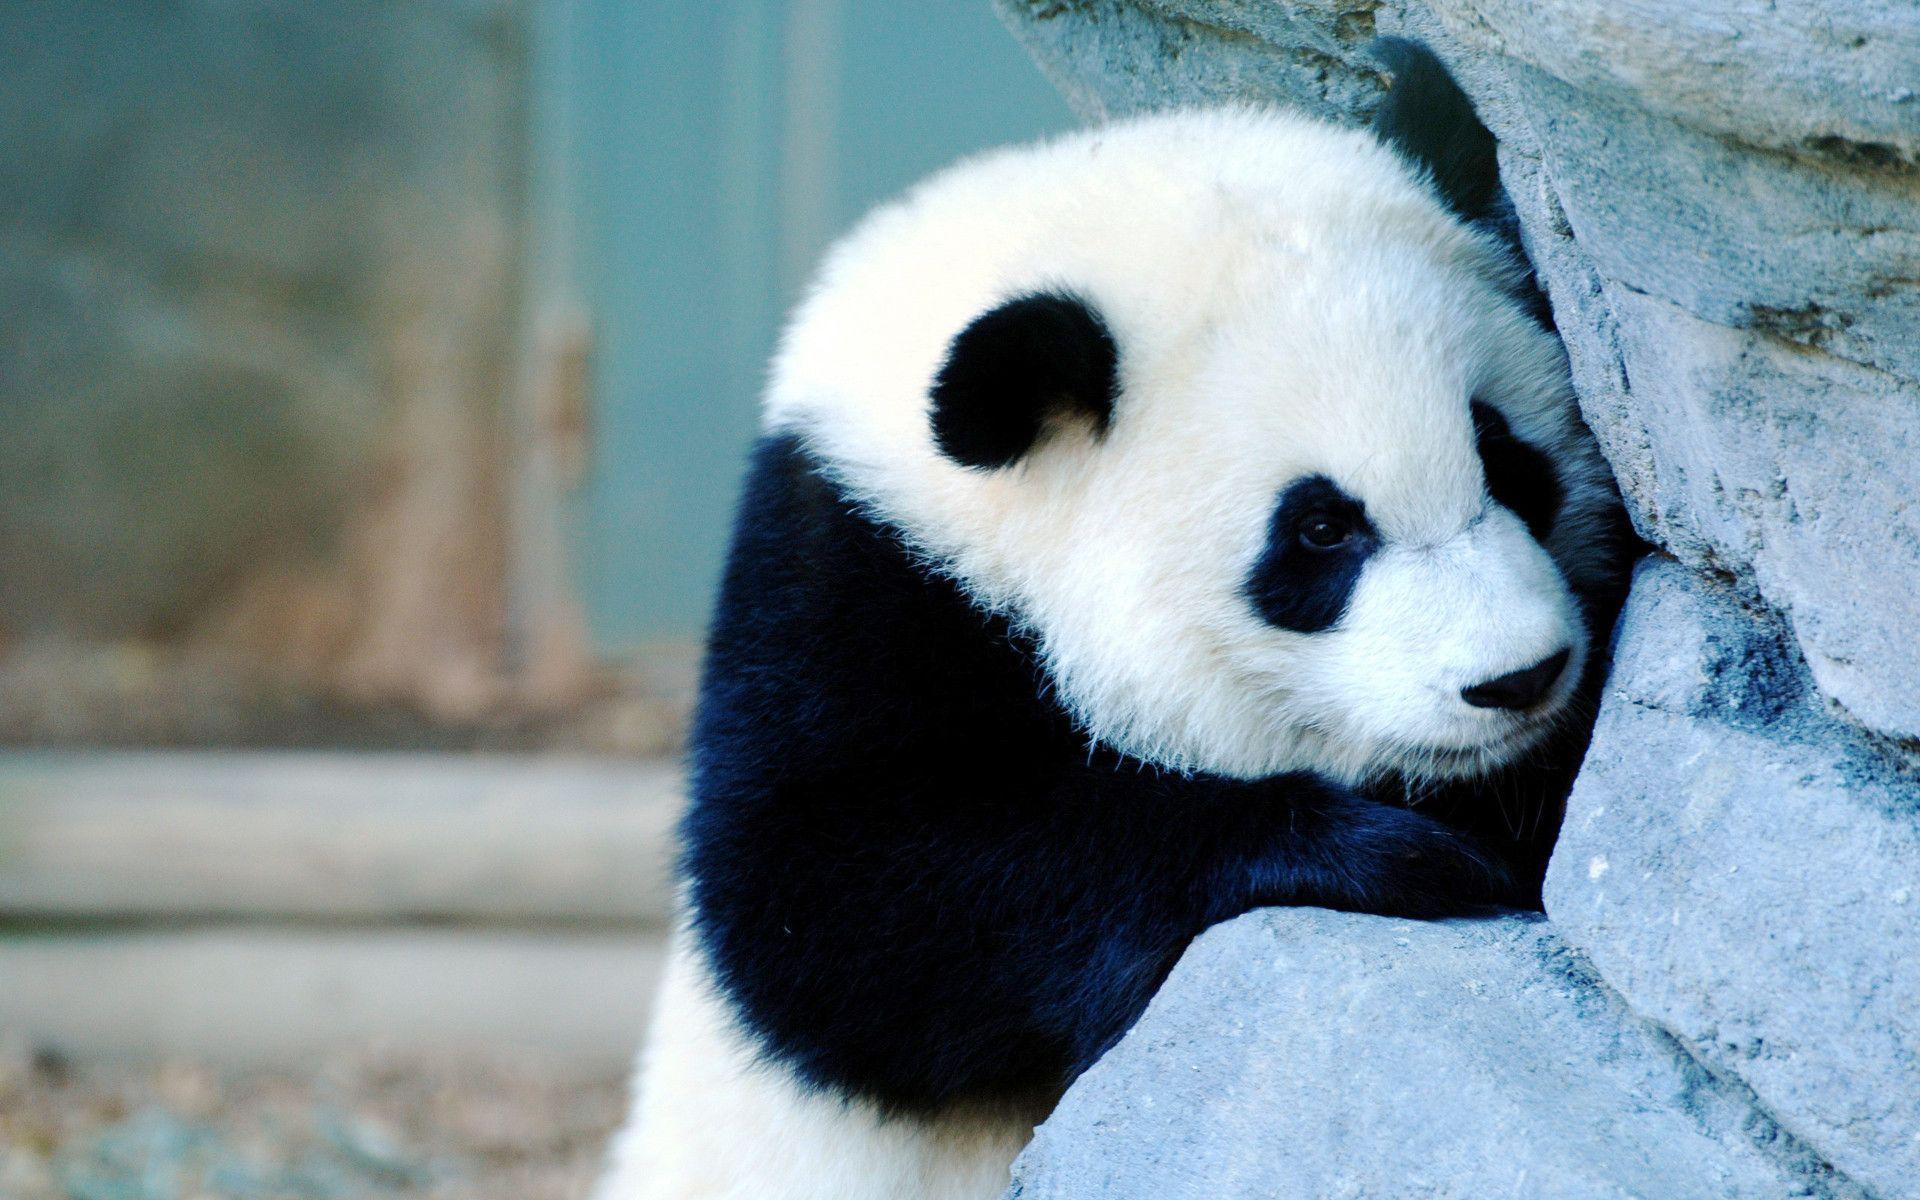 Baby Panda Wallpapers 1920x1200